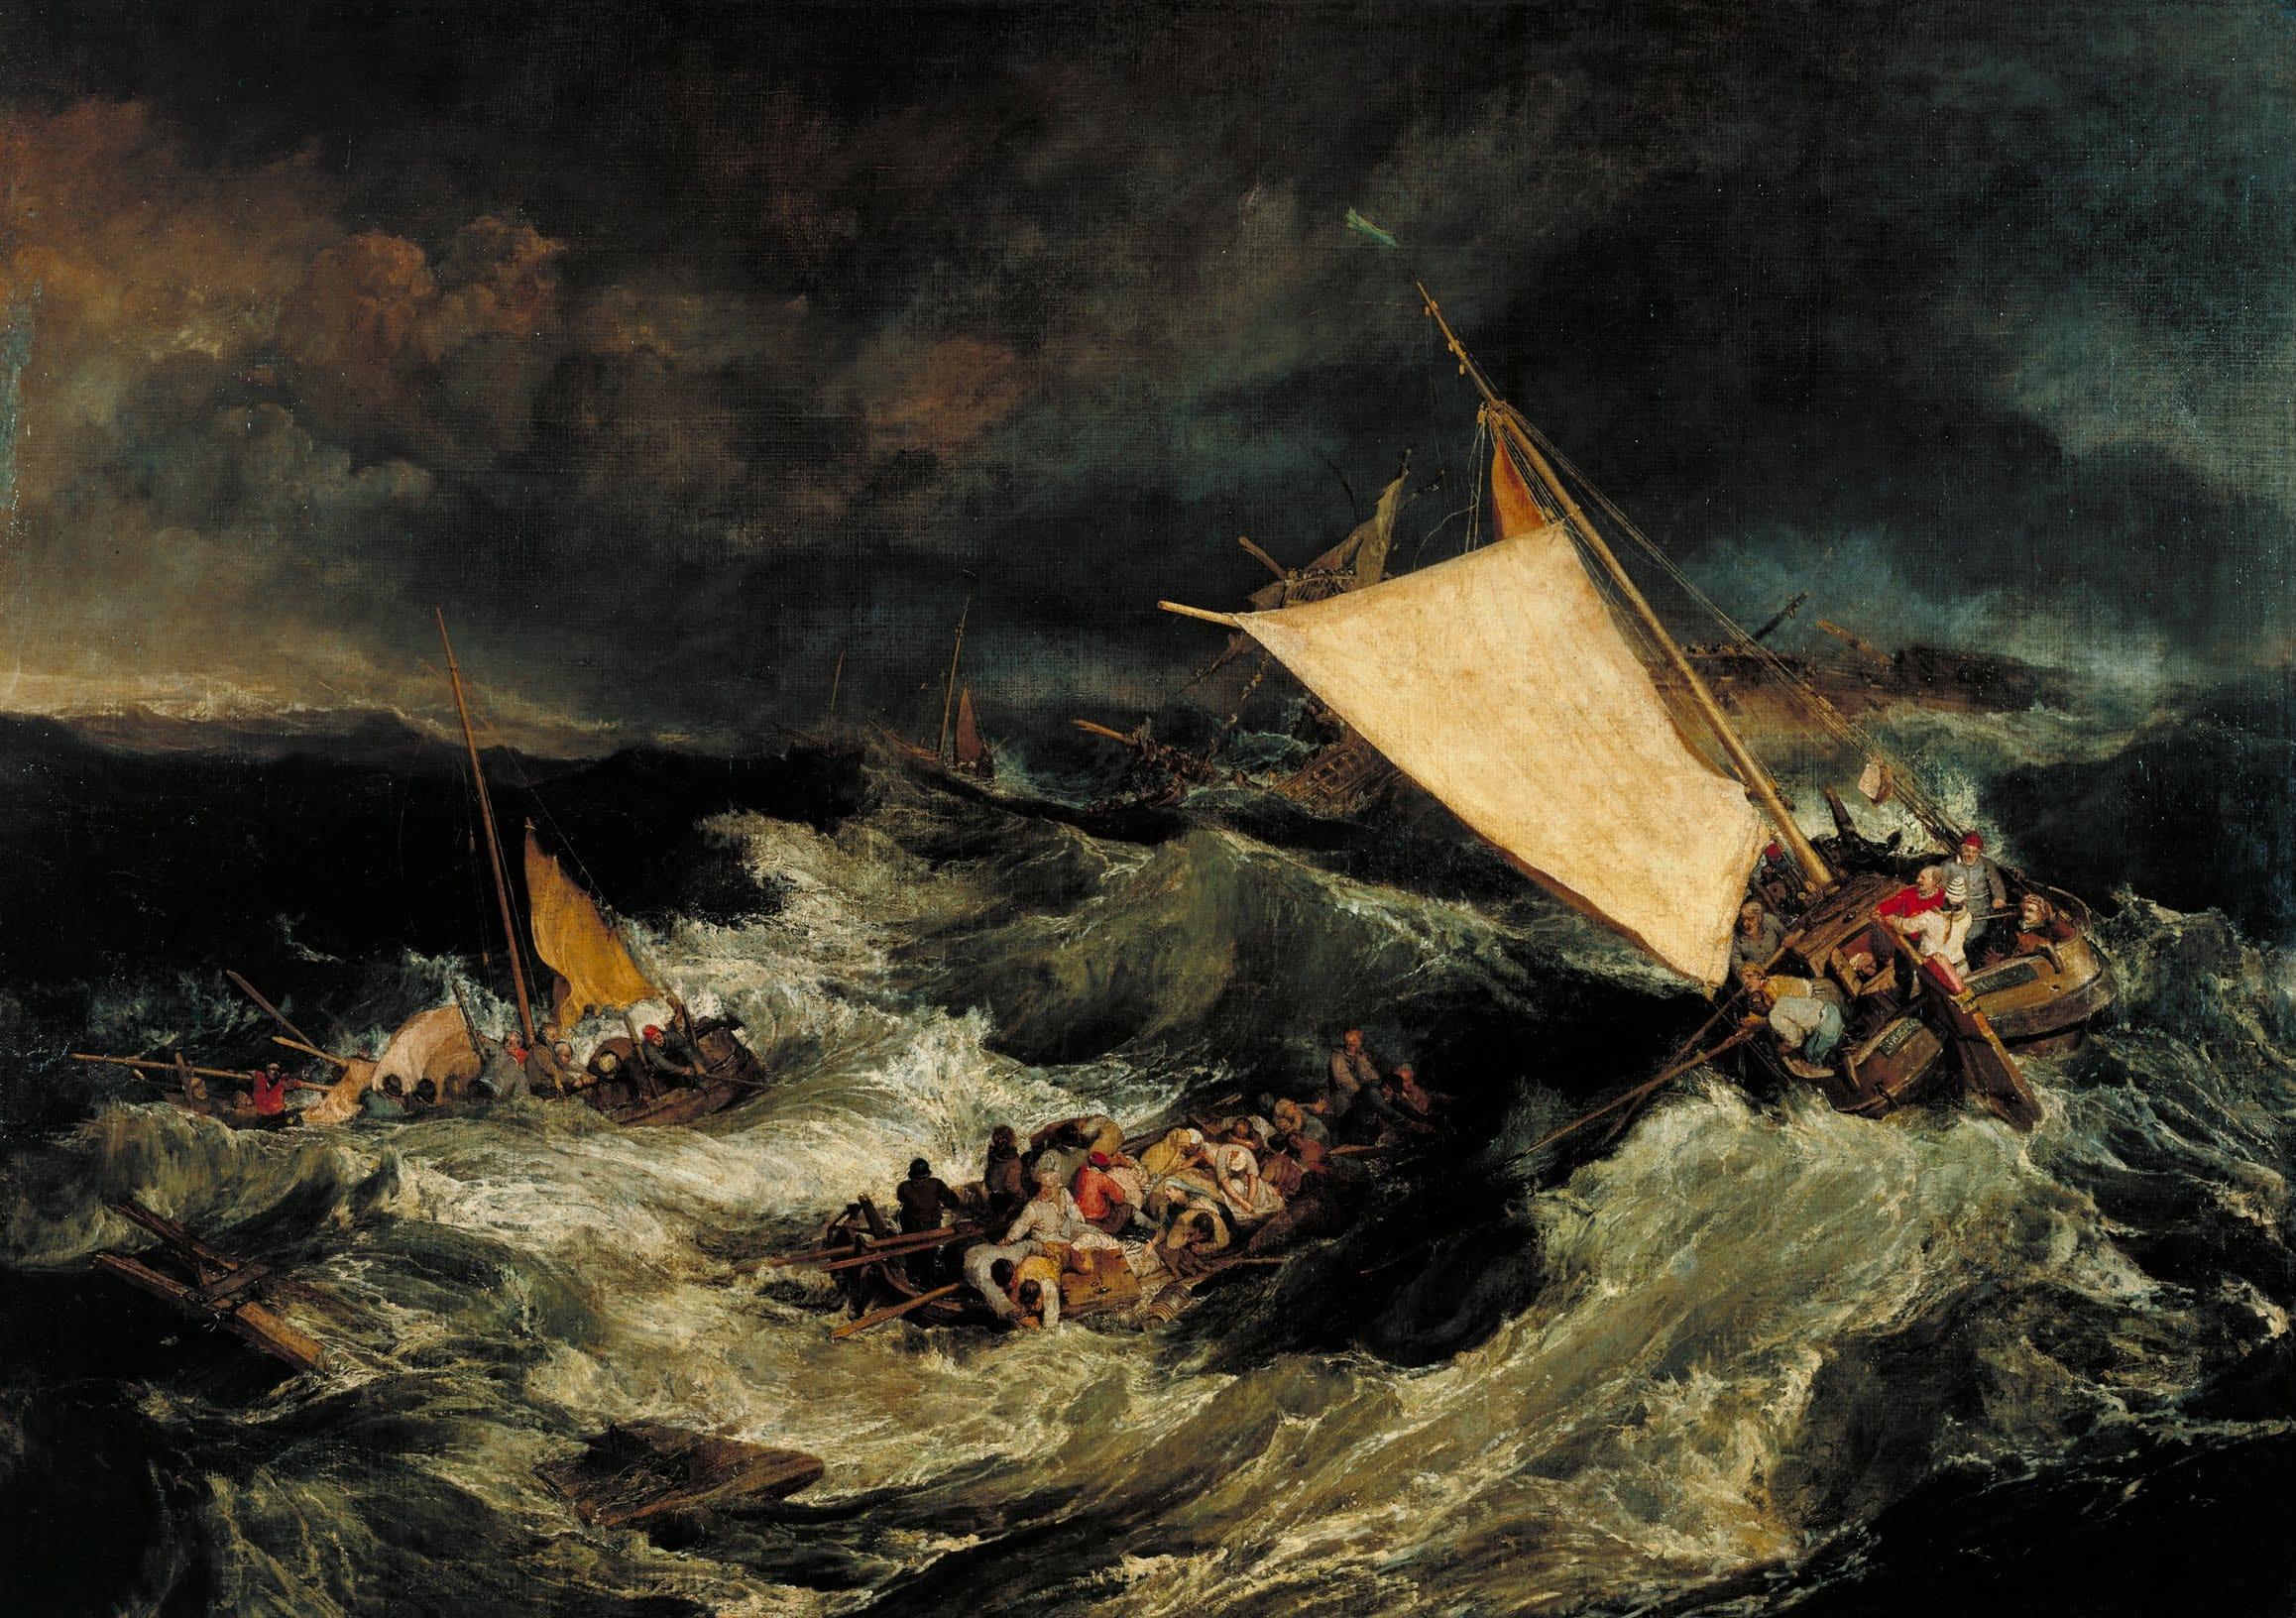 J.M.W. Turner,  The Shipwreck  (1805)